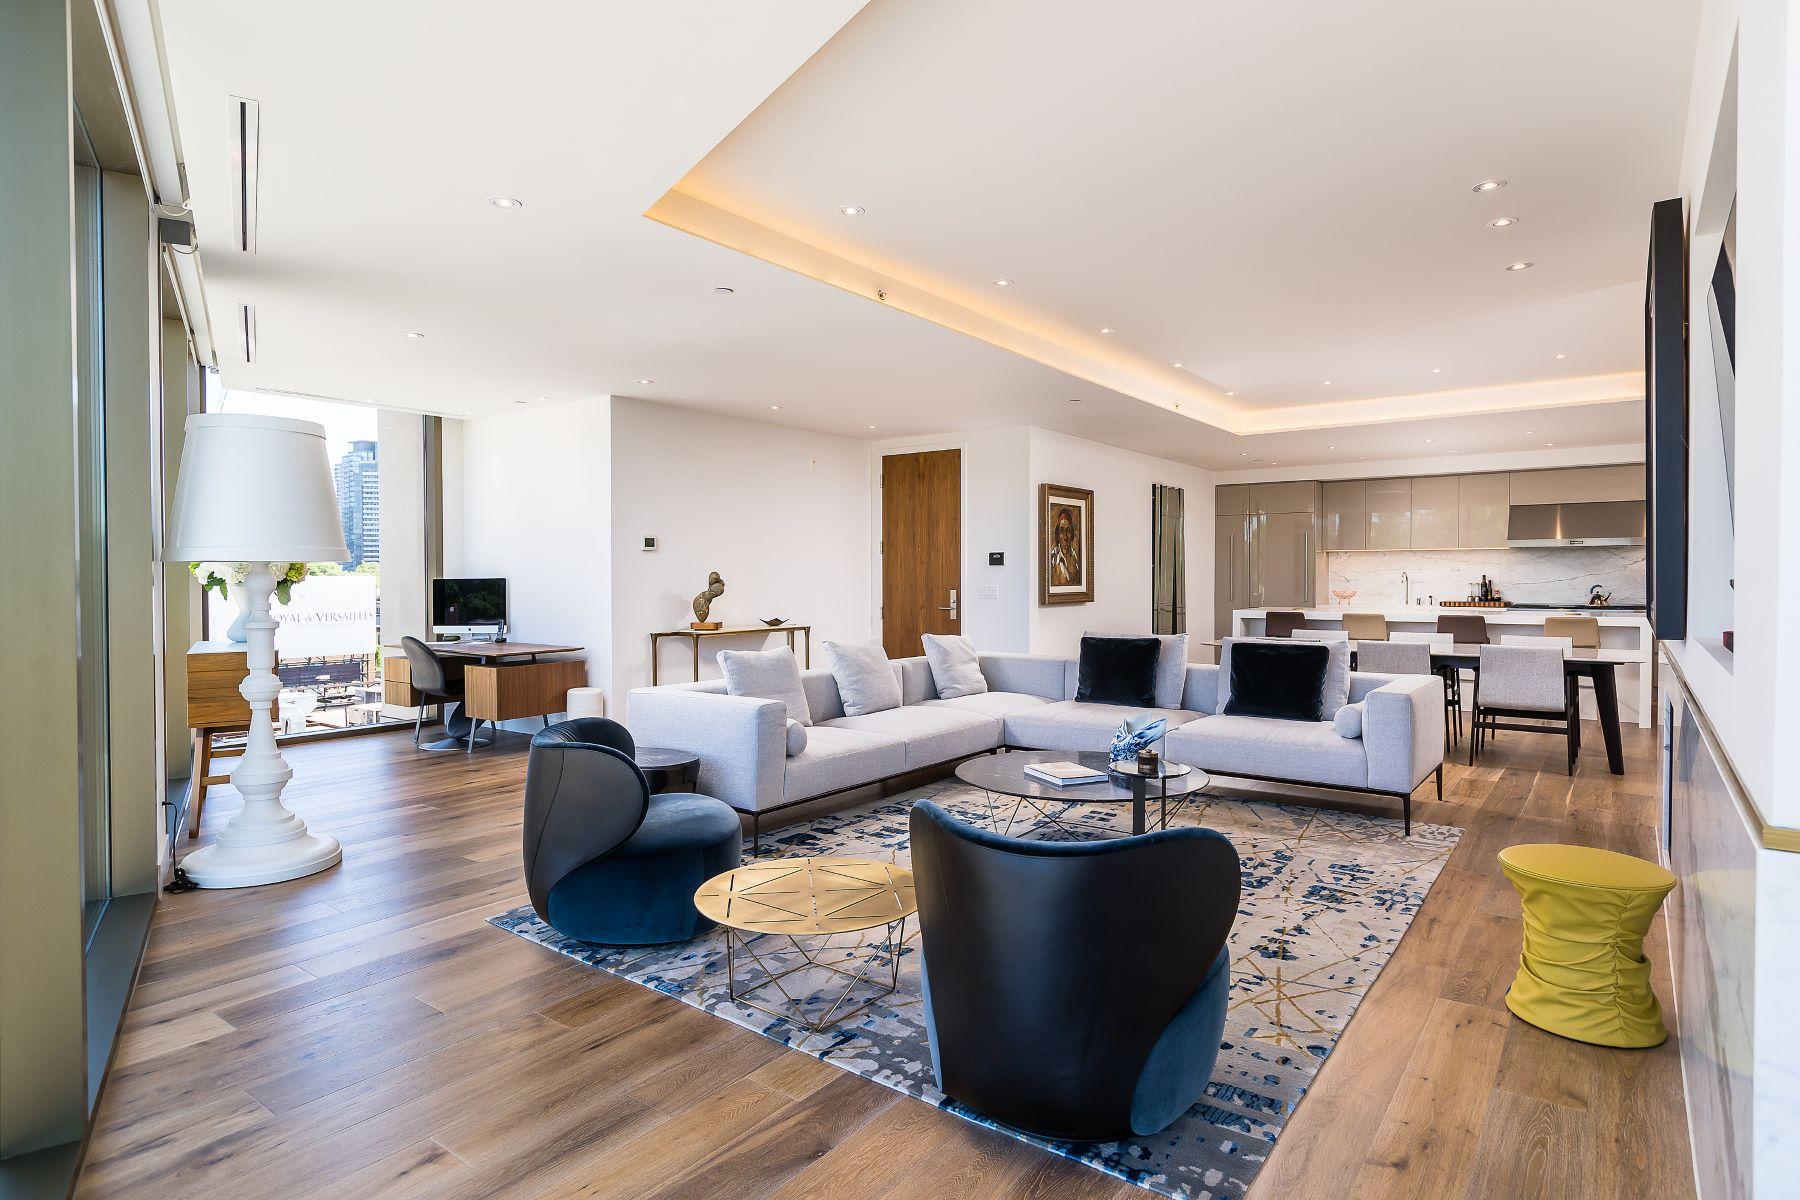 Condominium for Sale at 277 Davenport Road 277 Davenport Rd 502 Toronto, Ontario M5R 1J9 Canada